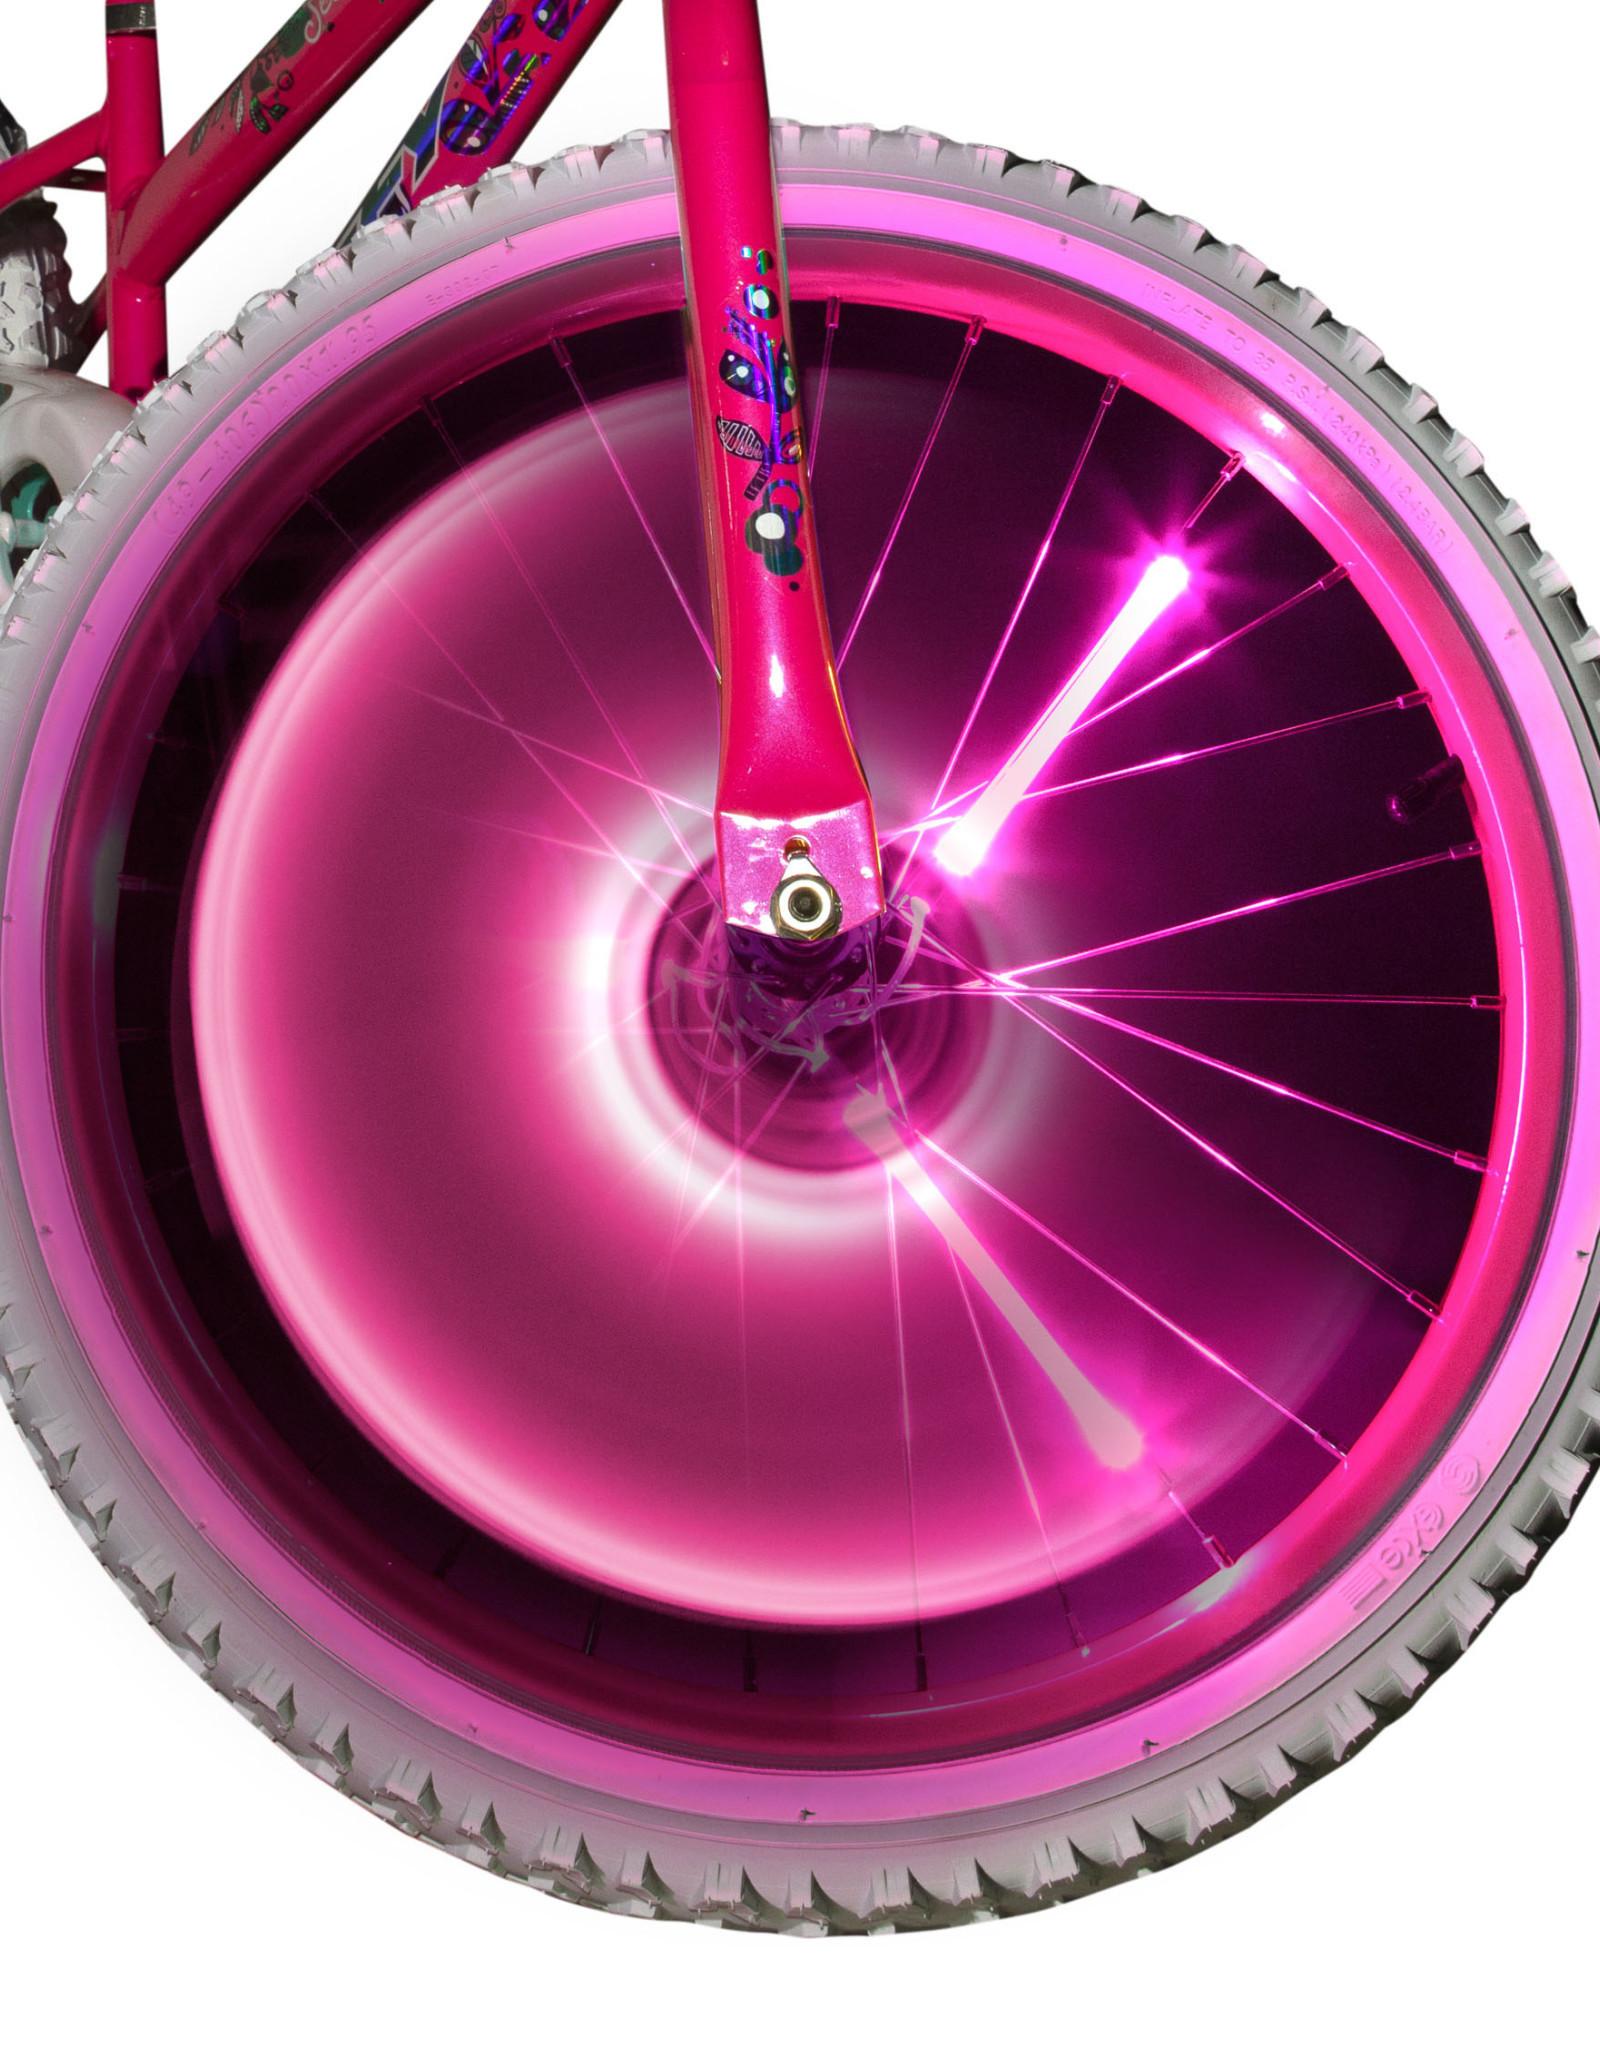 Brightz Bike Spin Kidz Brightz - Pink